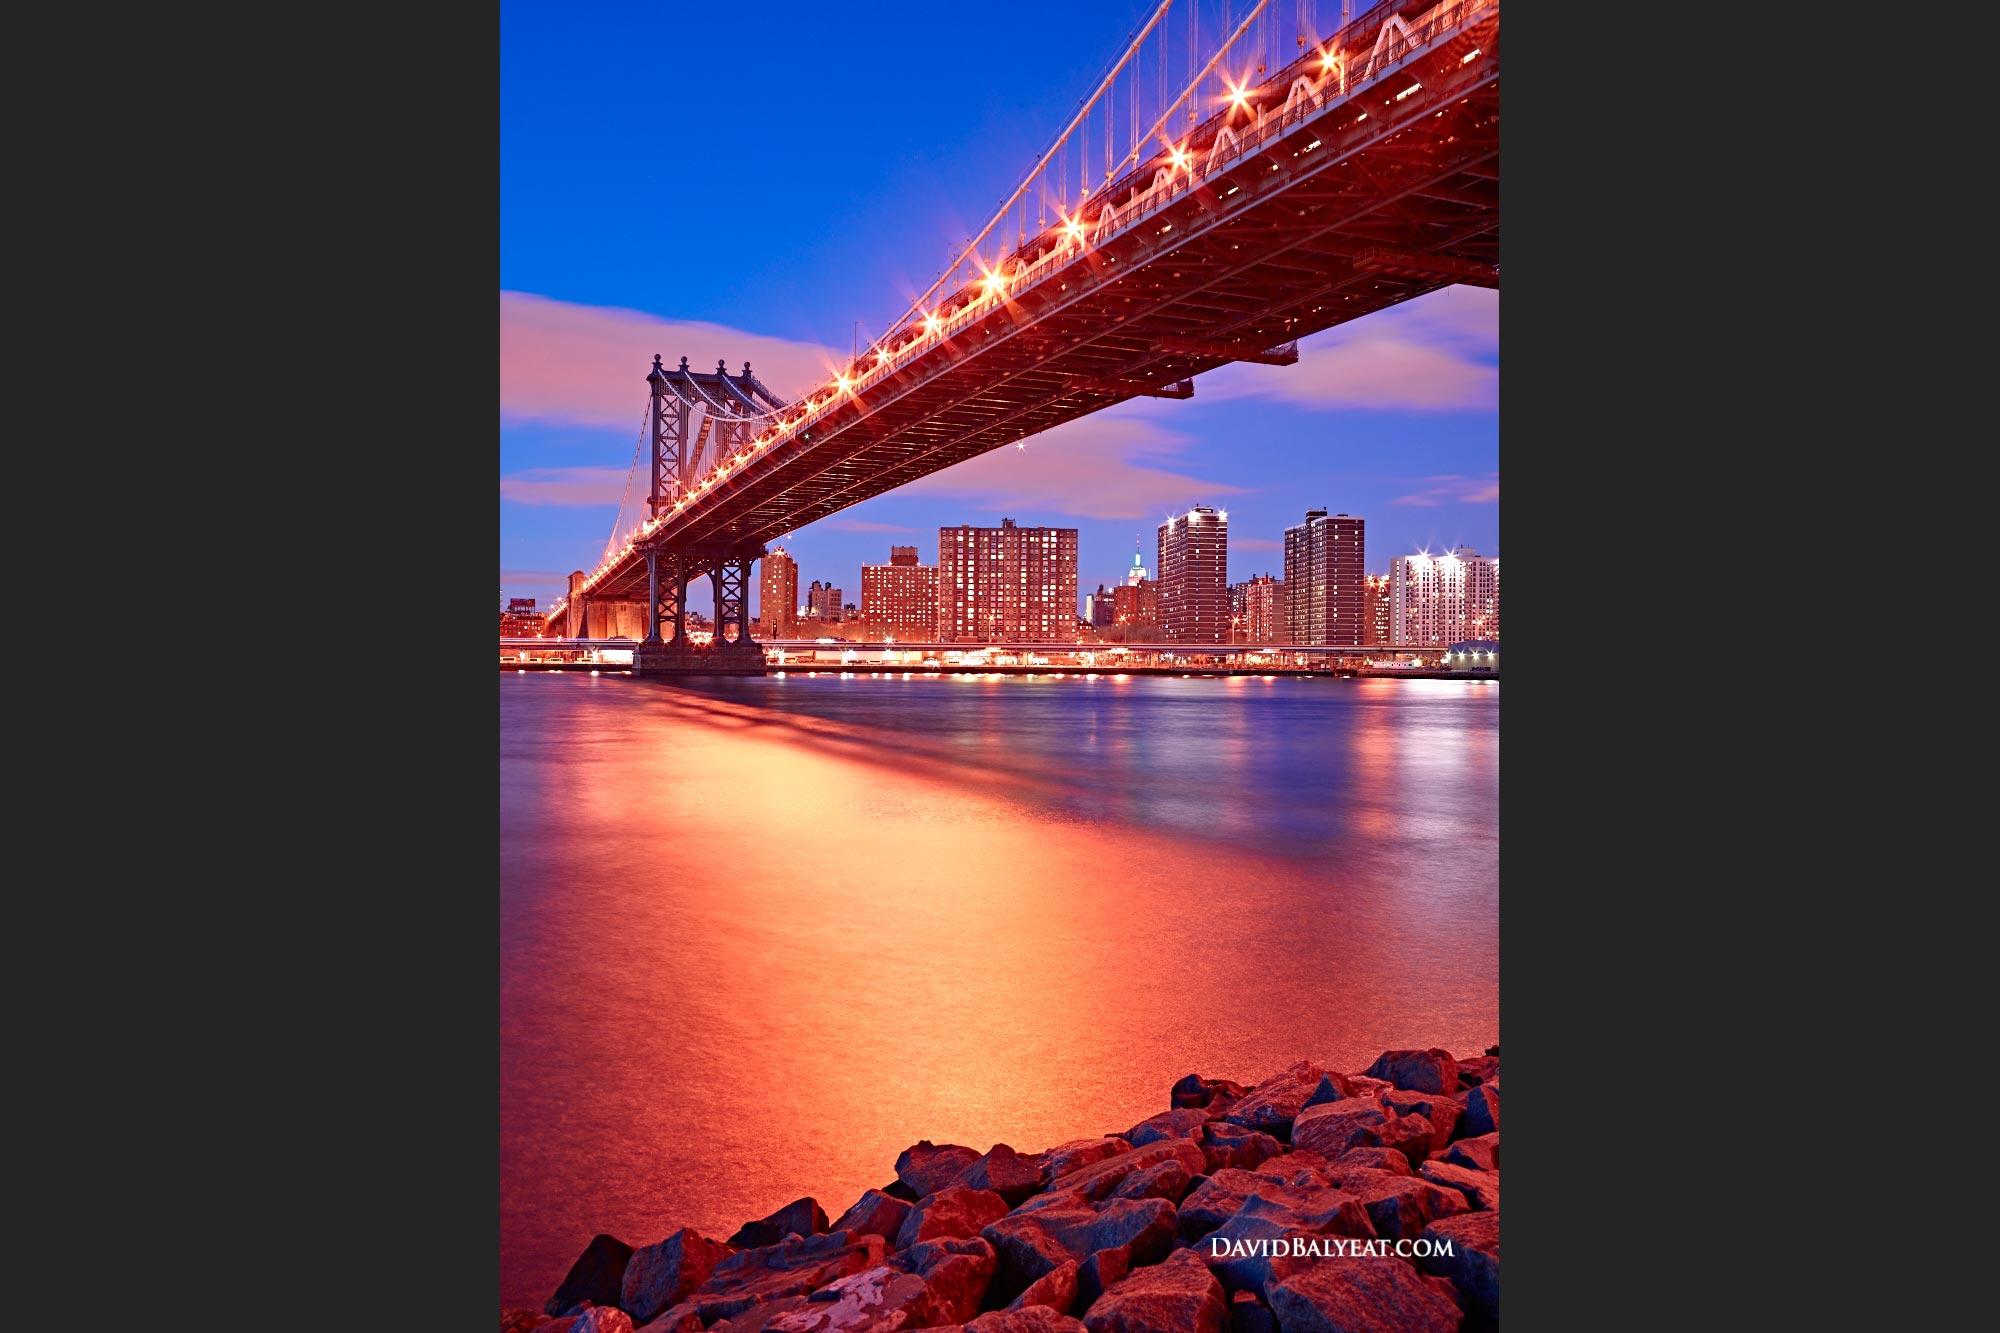 Manhattan Bridge New York City skyline night high definition hd photography